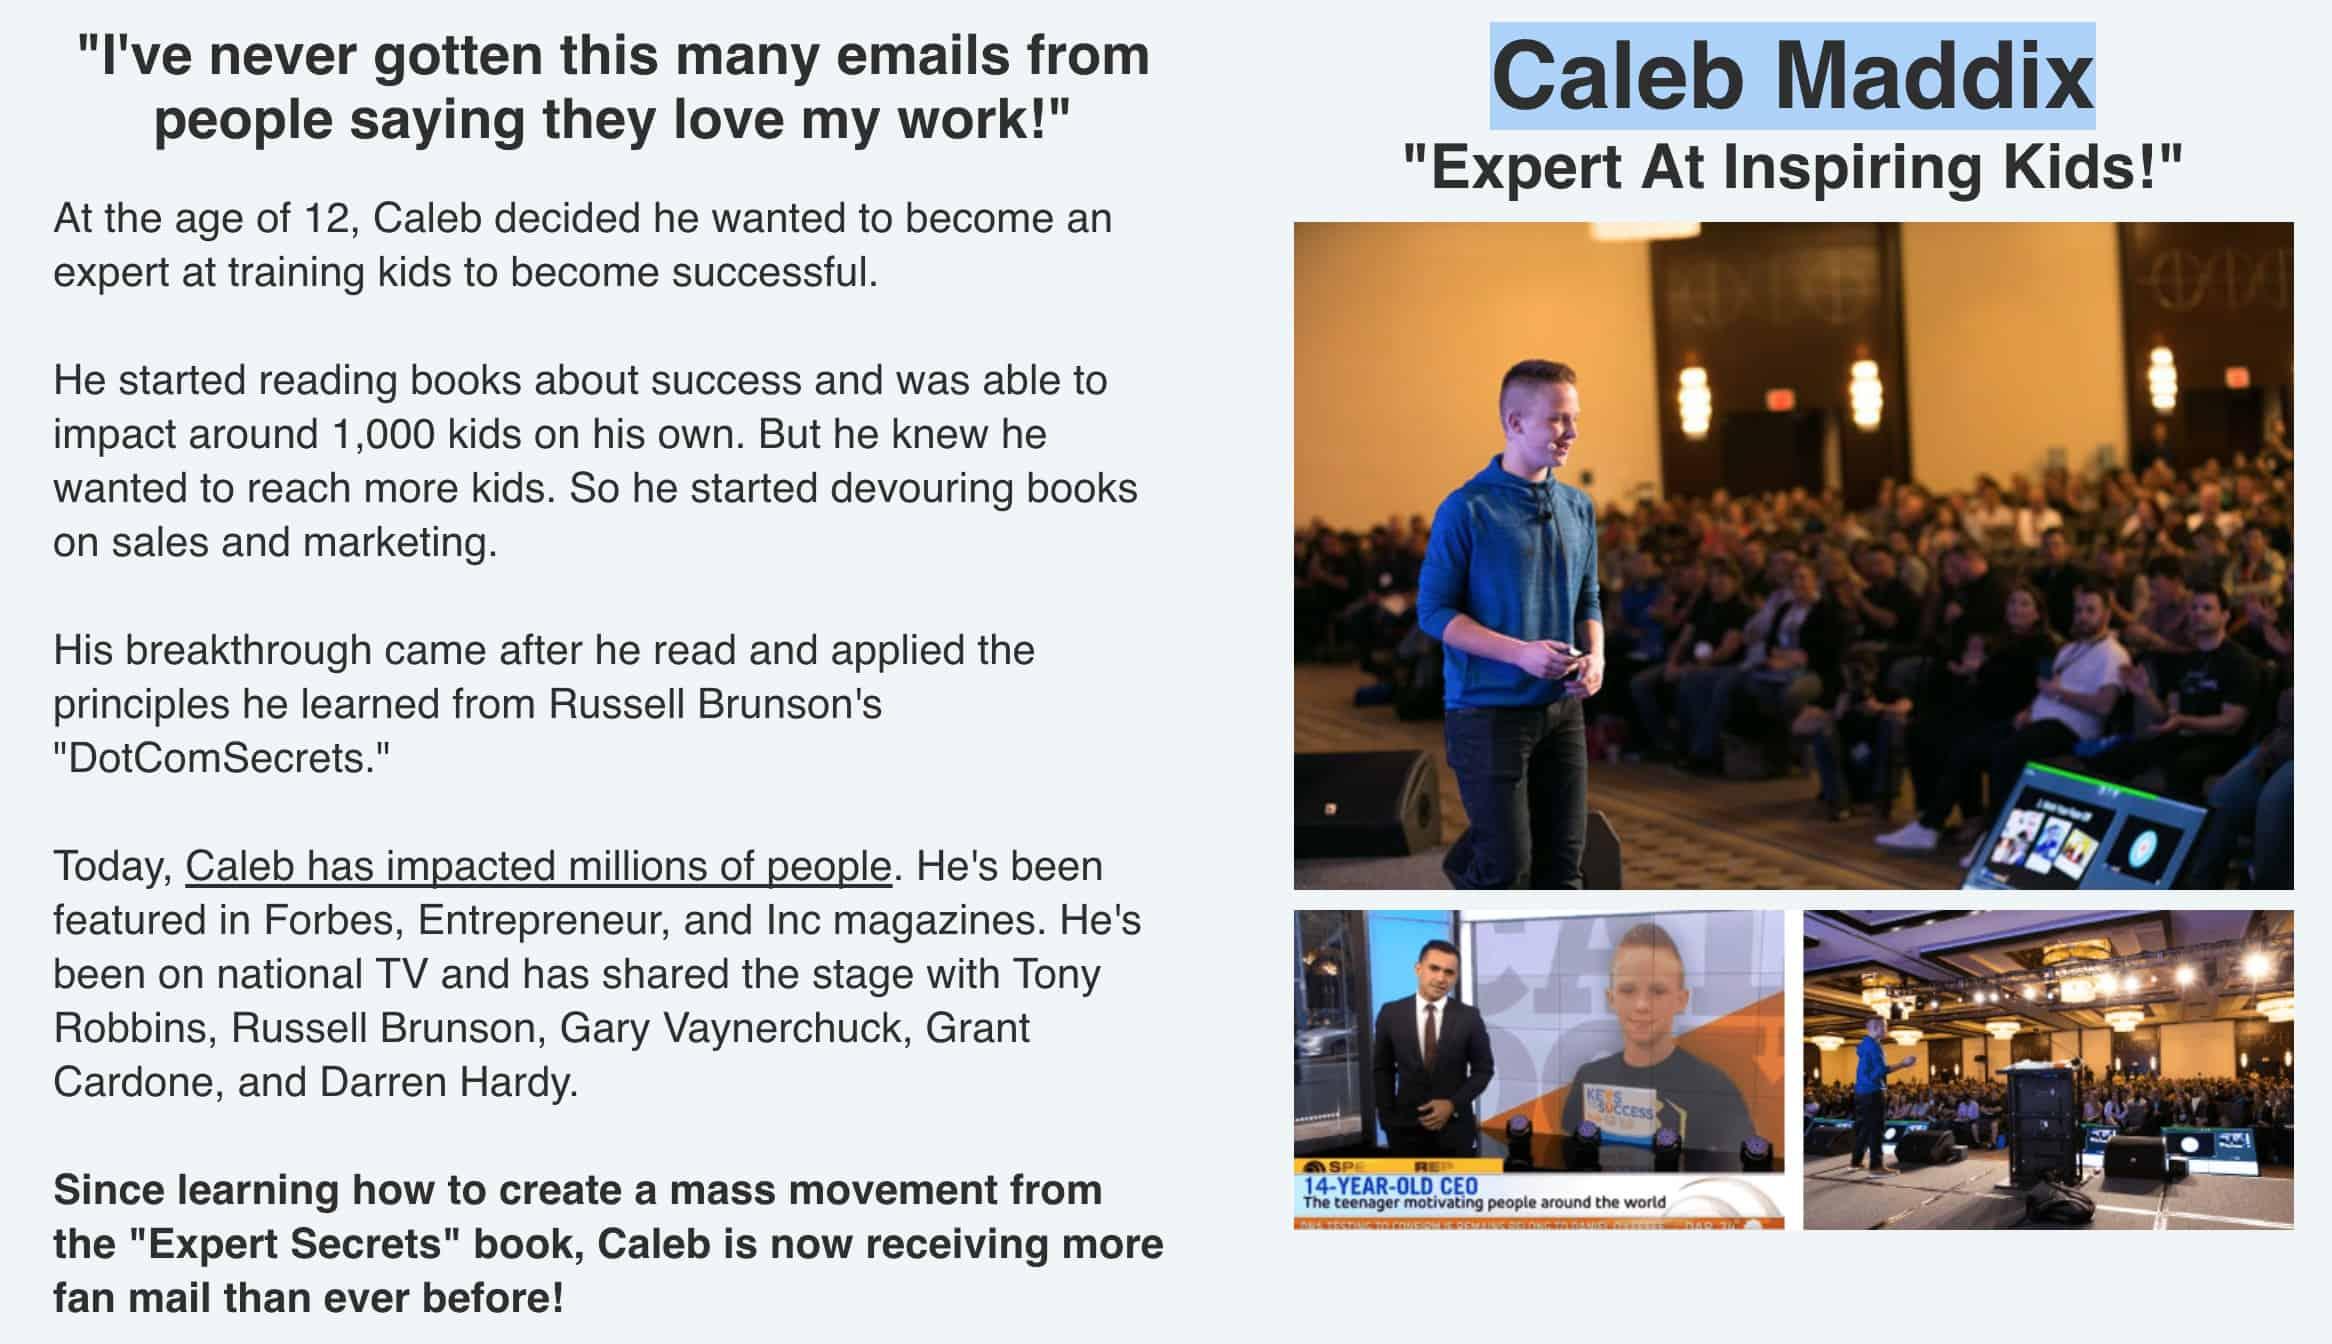 Expert Secrets Caleb Maddix